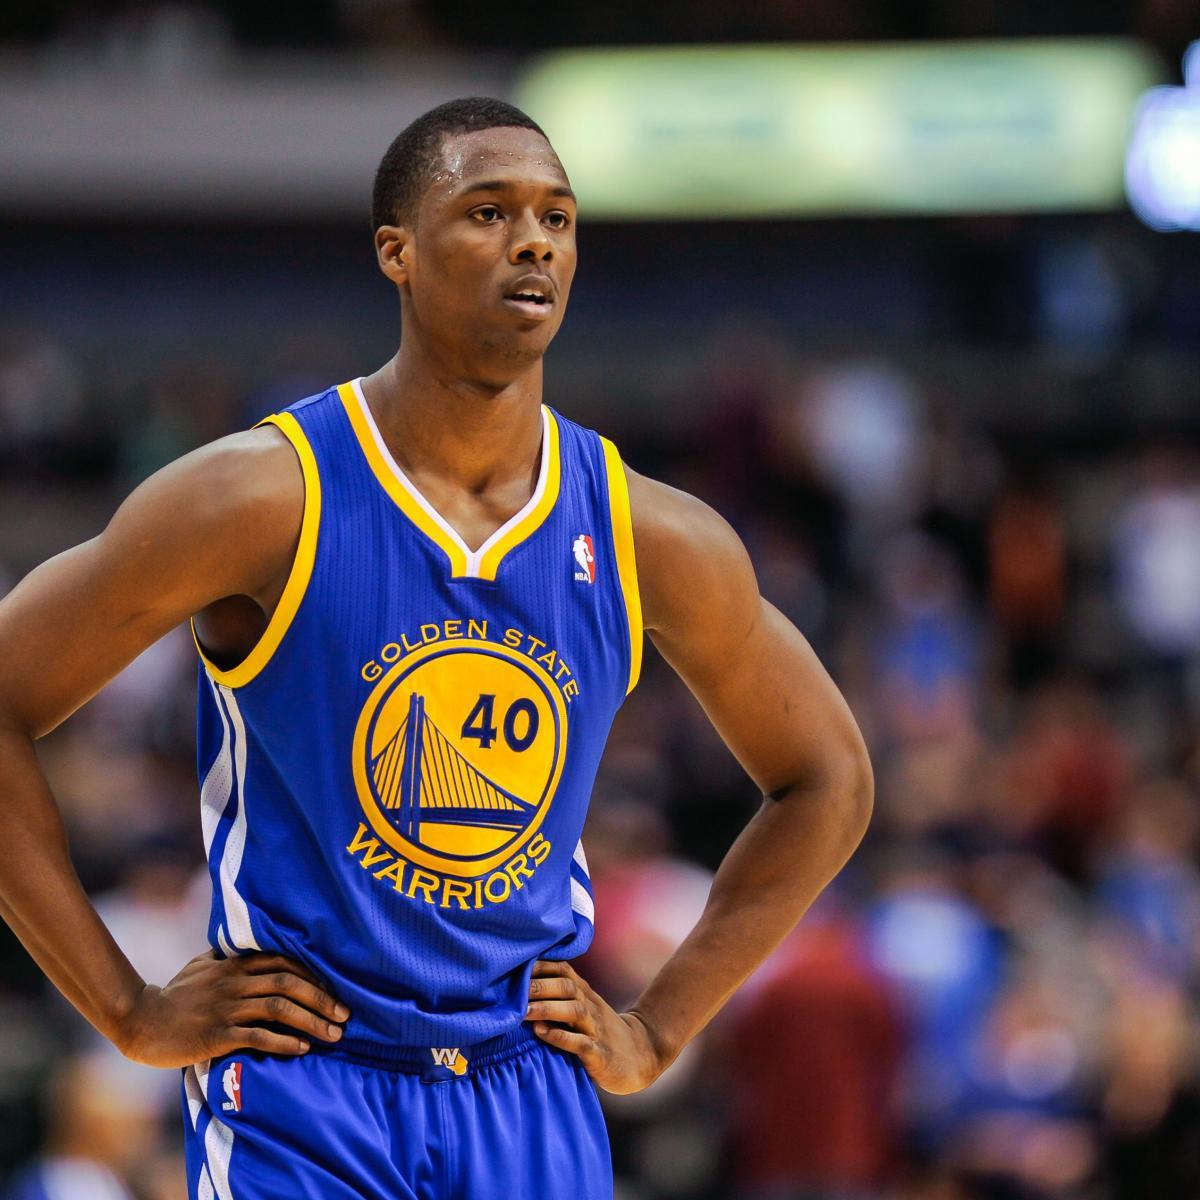 Harrison Barnes Nba: What Harrison Barnes' Monster Dunk Tells Us About His NBA